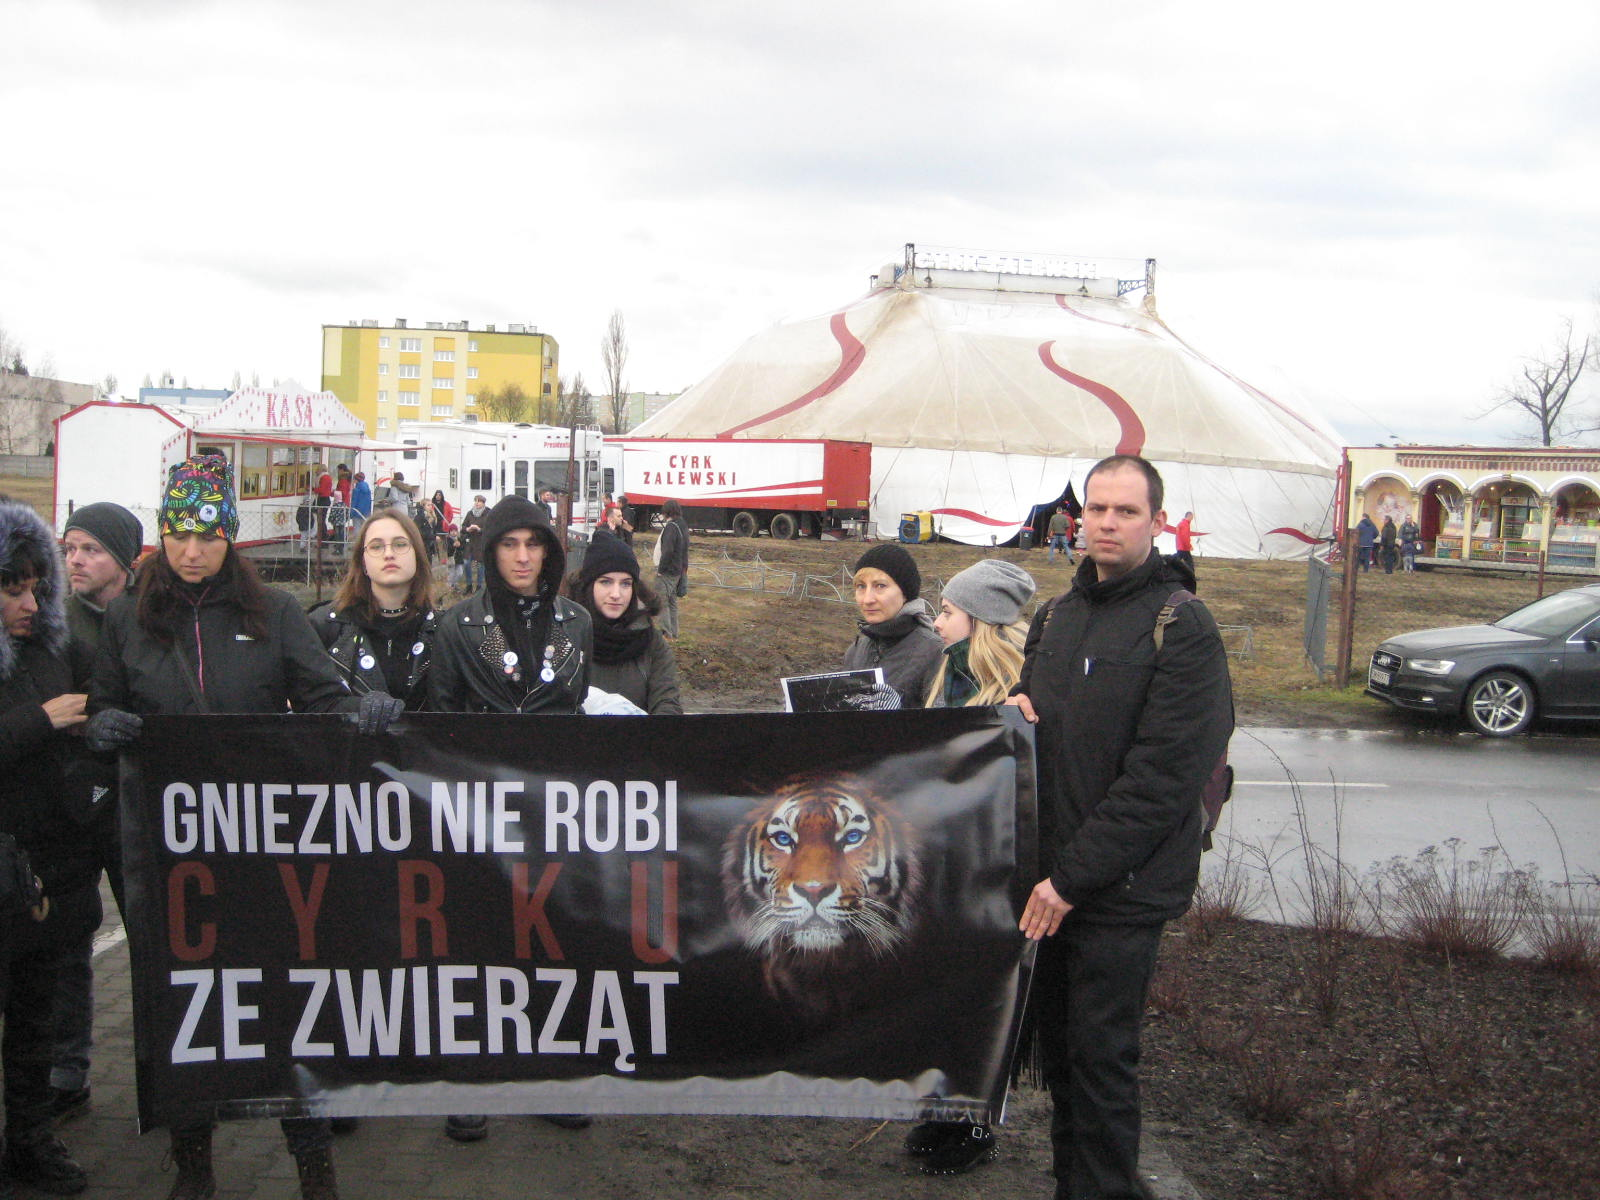 cyrk protest Gniezno - Rafał Muniak